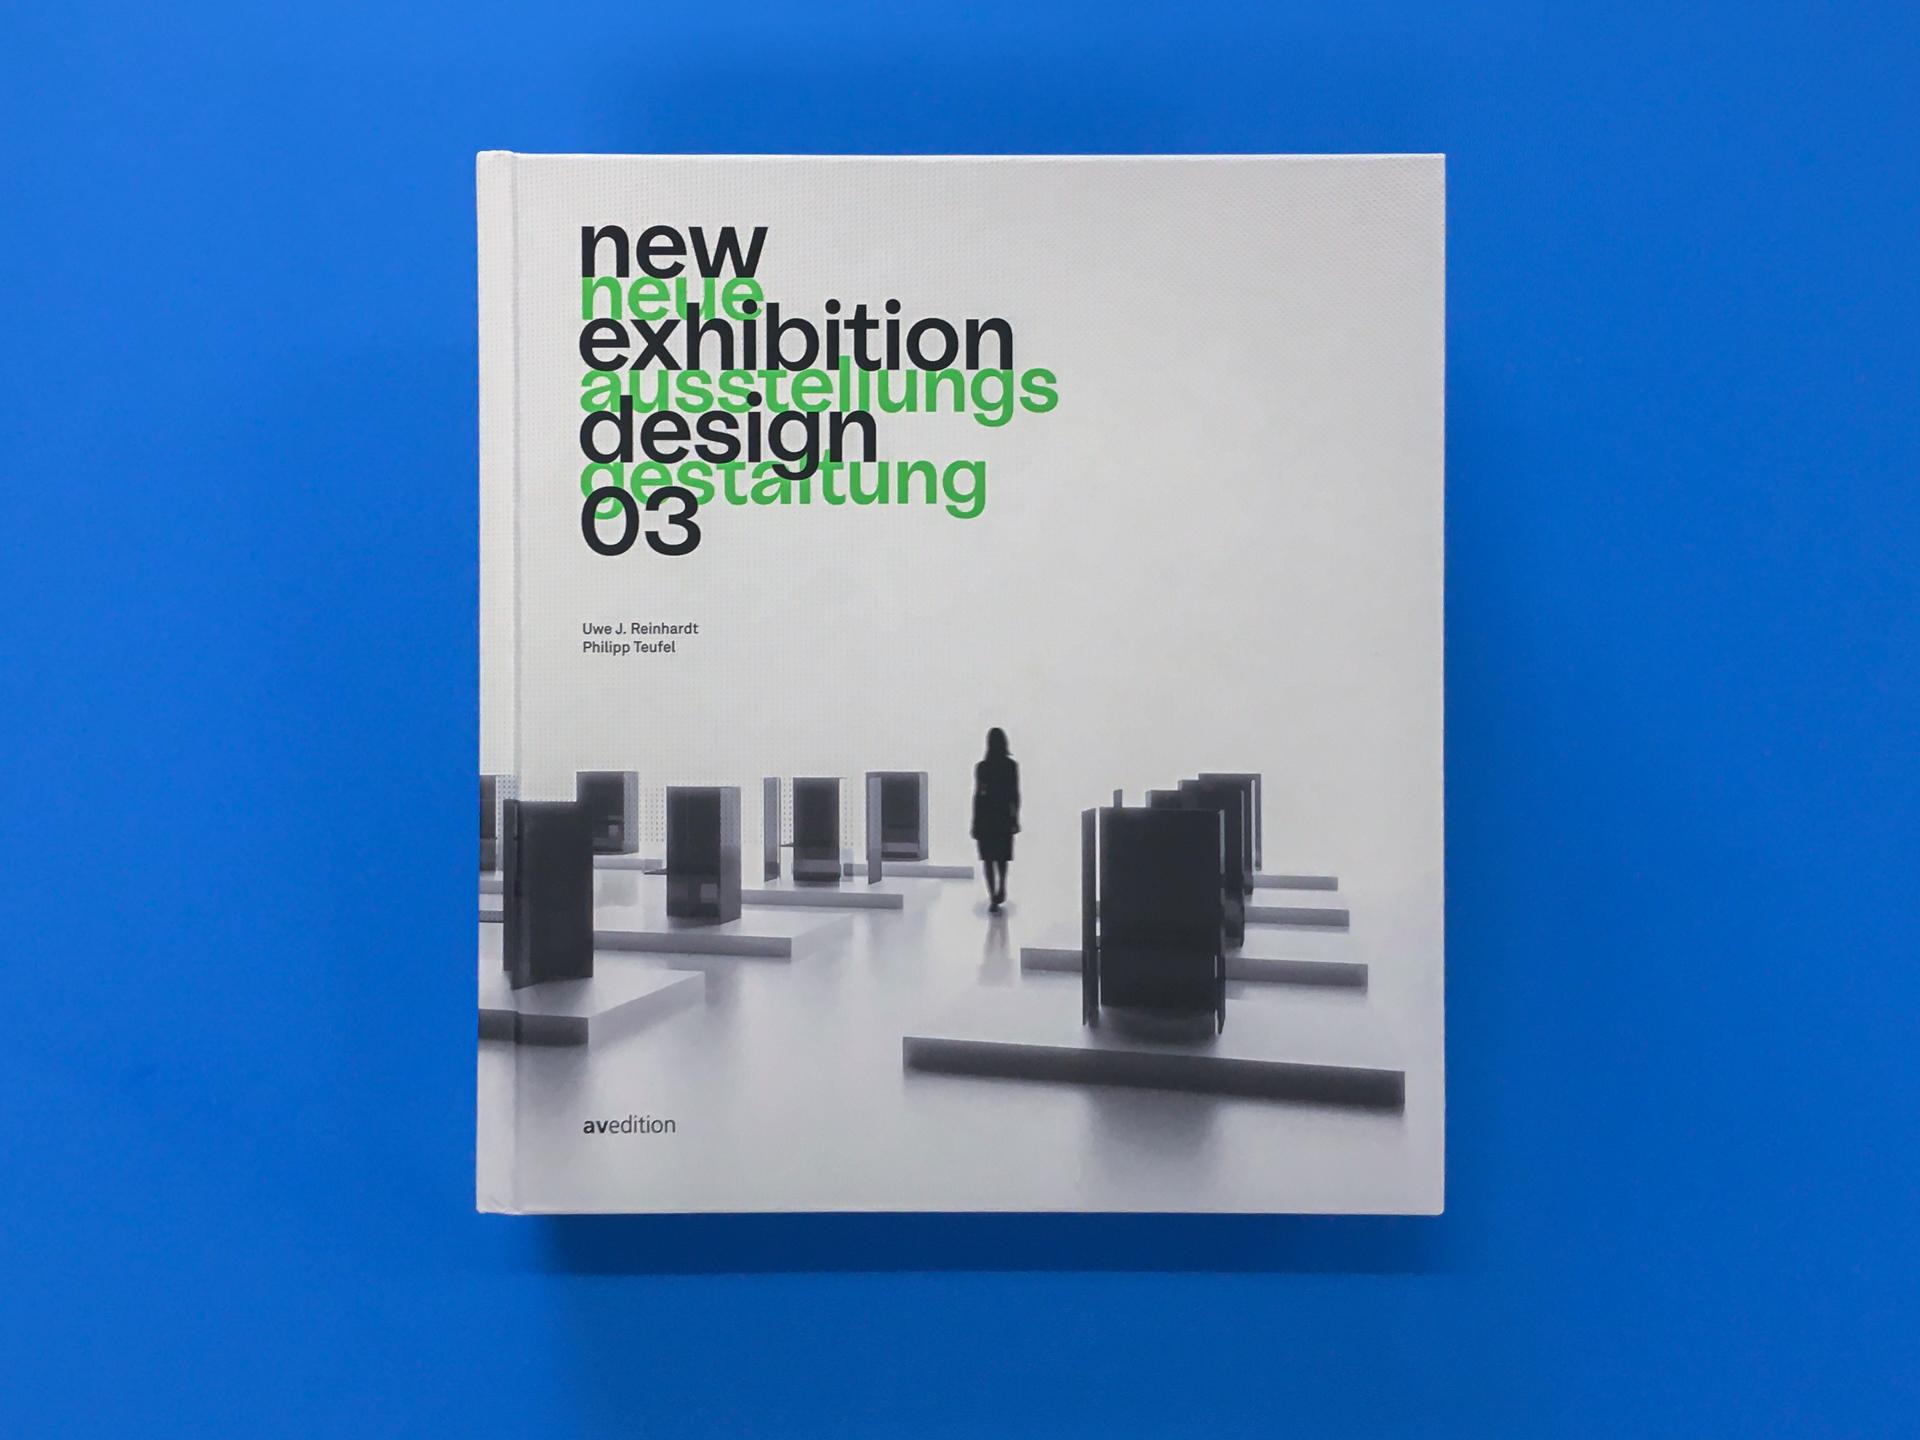 dvvd na tm new exhibition design 03 book 1 jpg